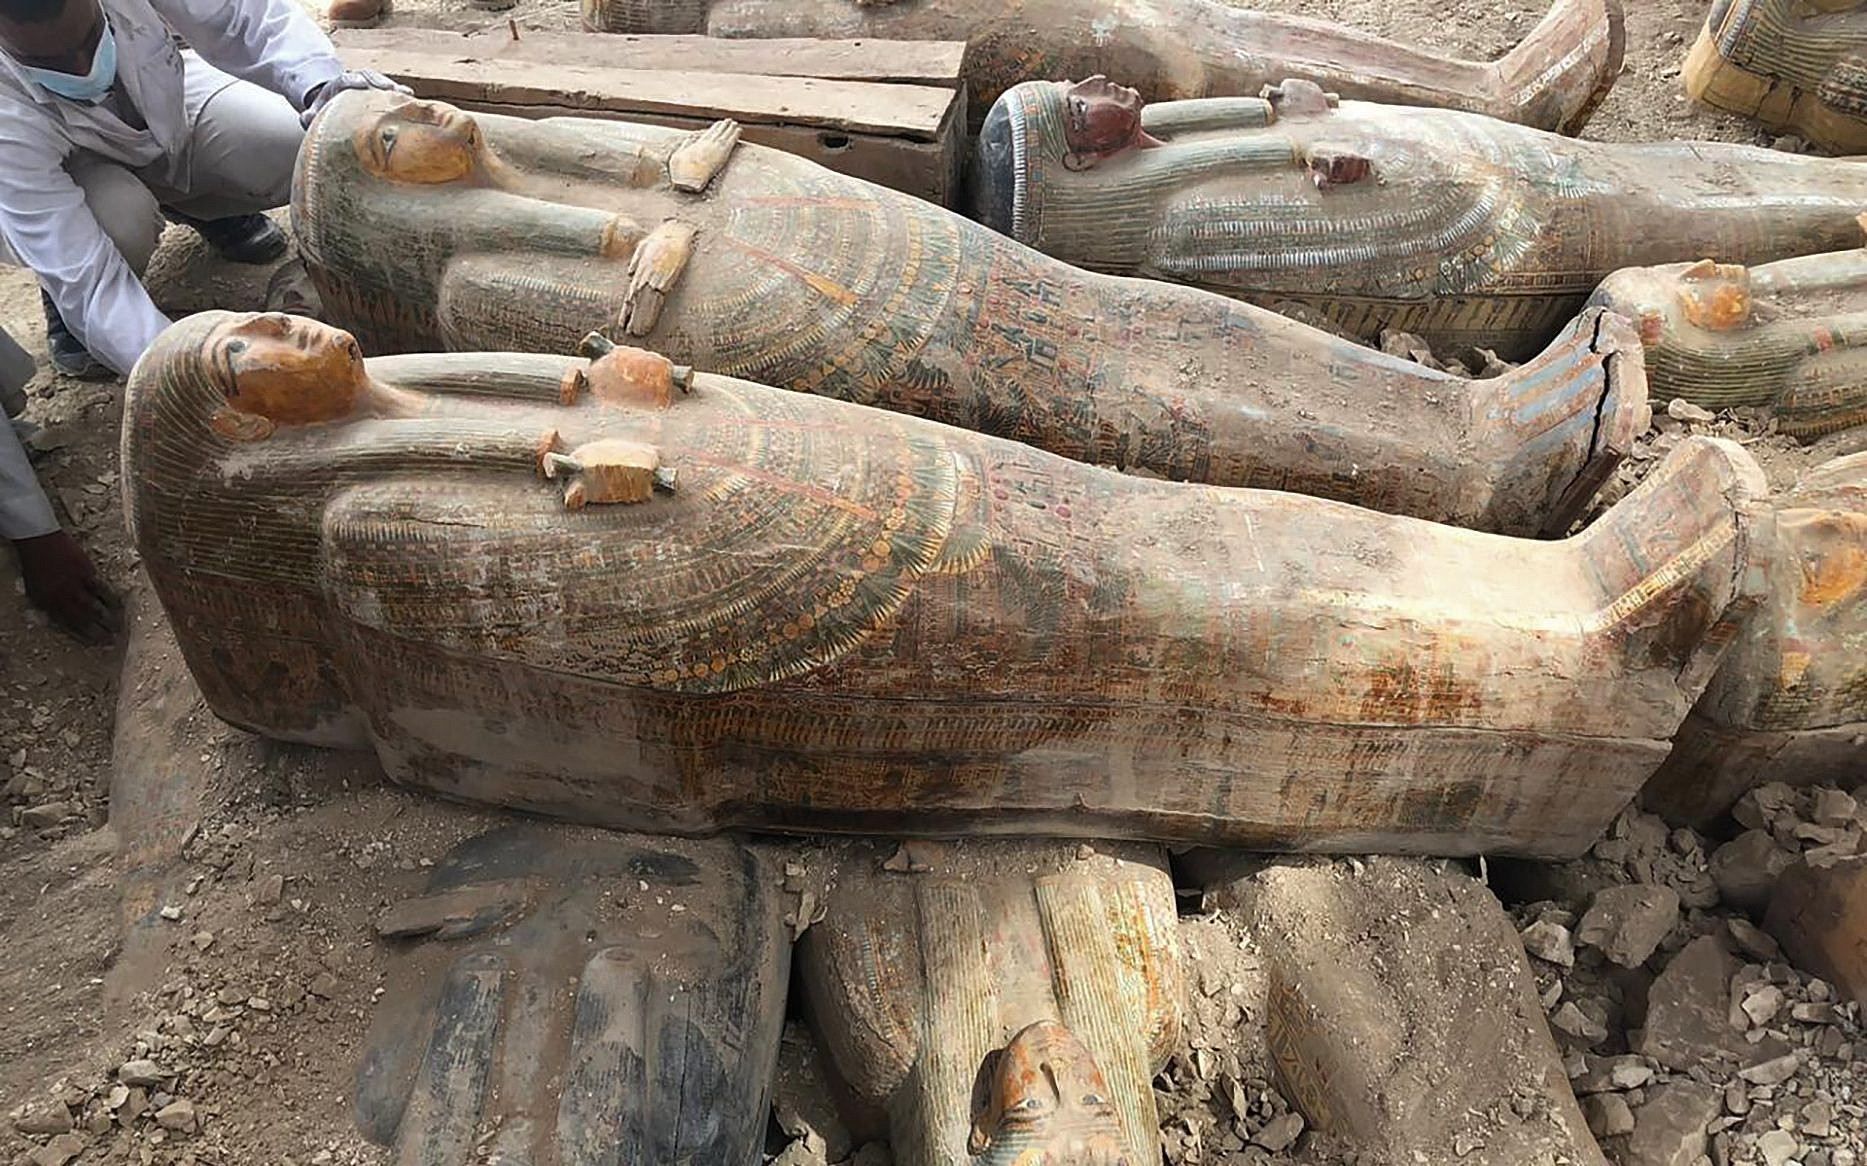 Twenty intact sarcophagi discovered in Egypt